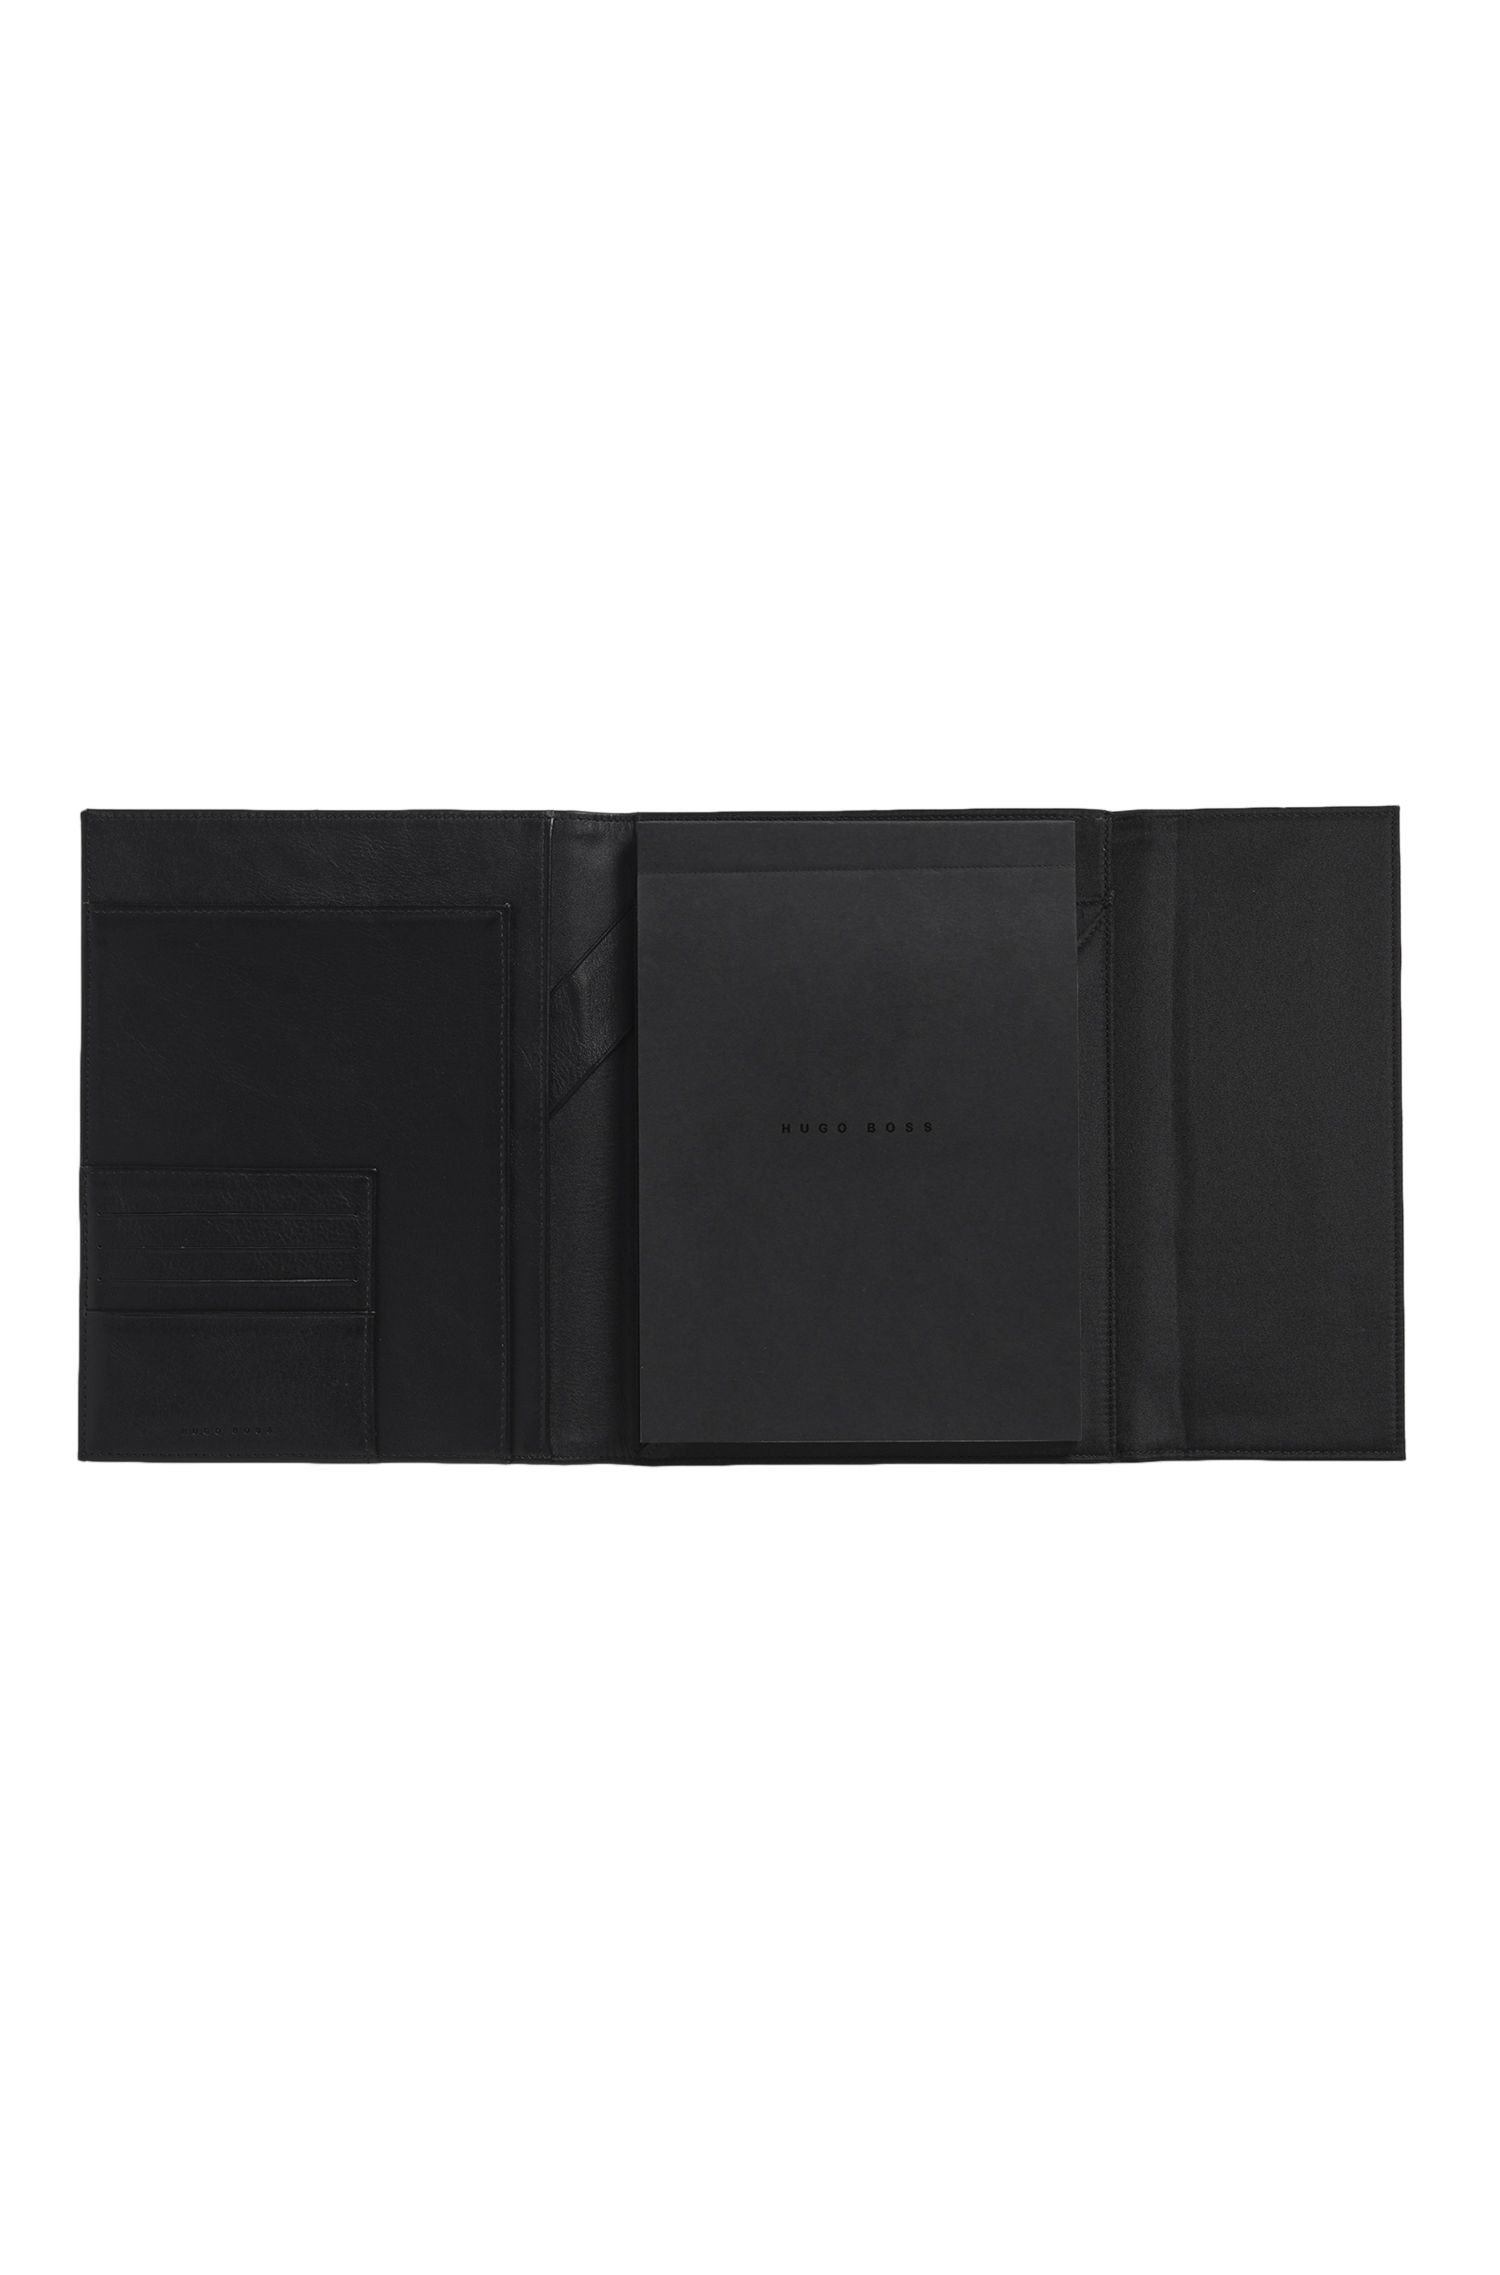 Leather A4 Portfolio with Notepad | Conference Folder A5 Caption Contrast BI, Black